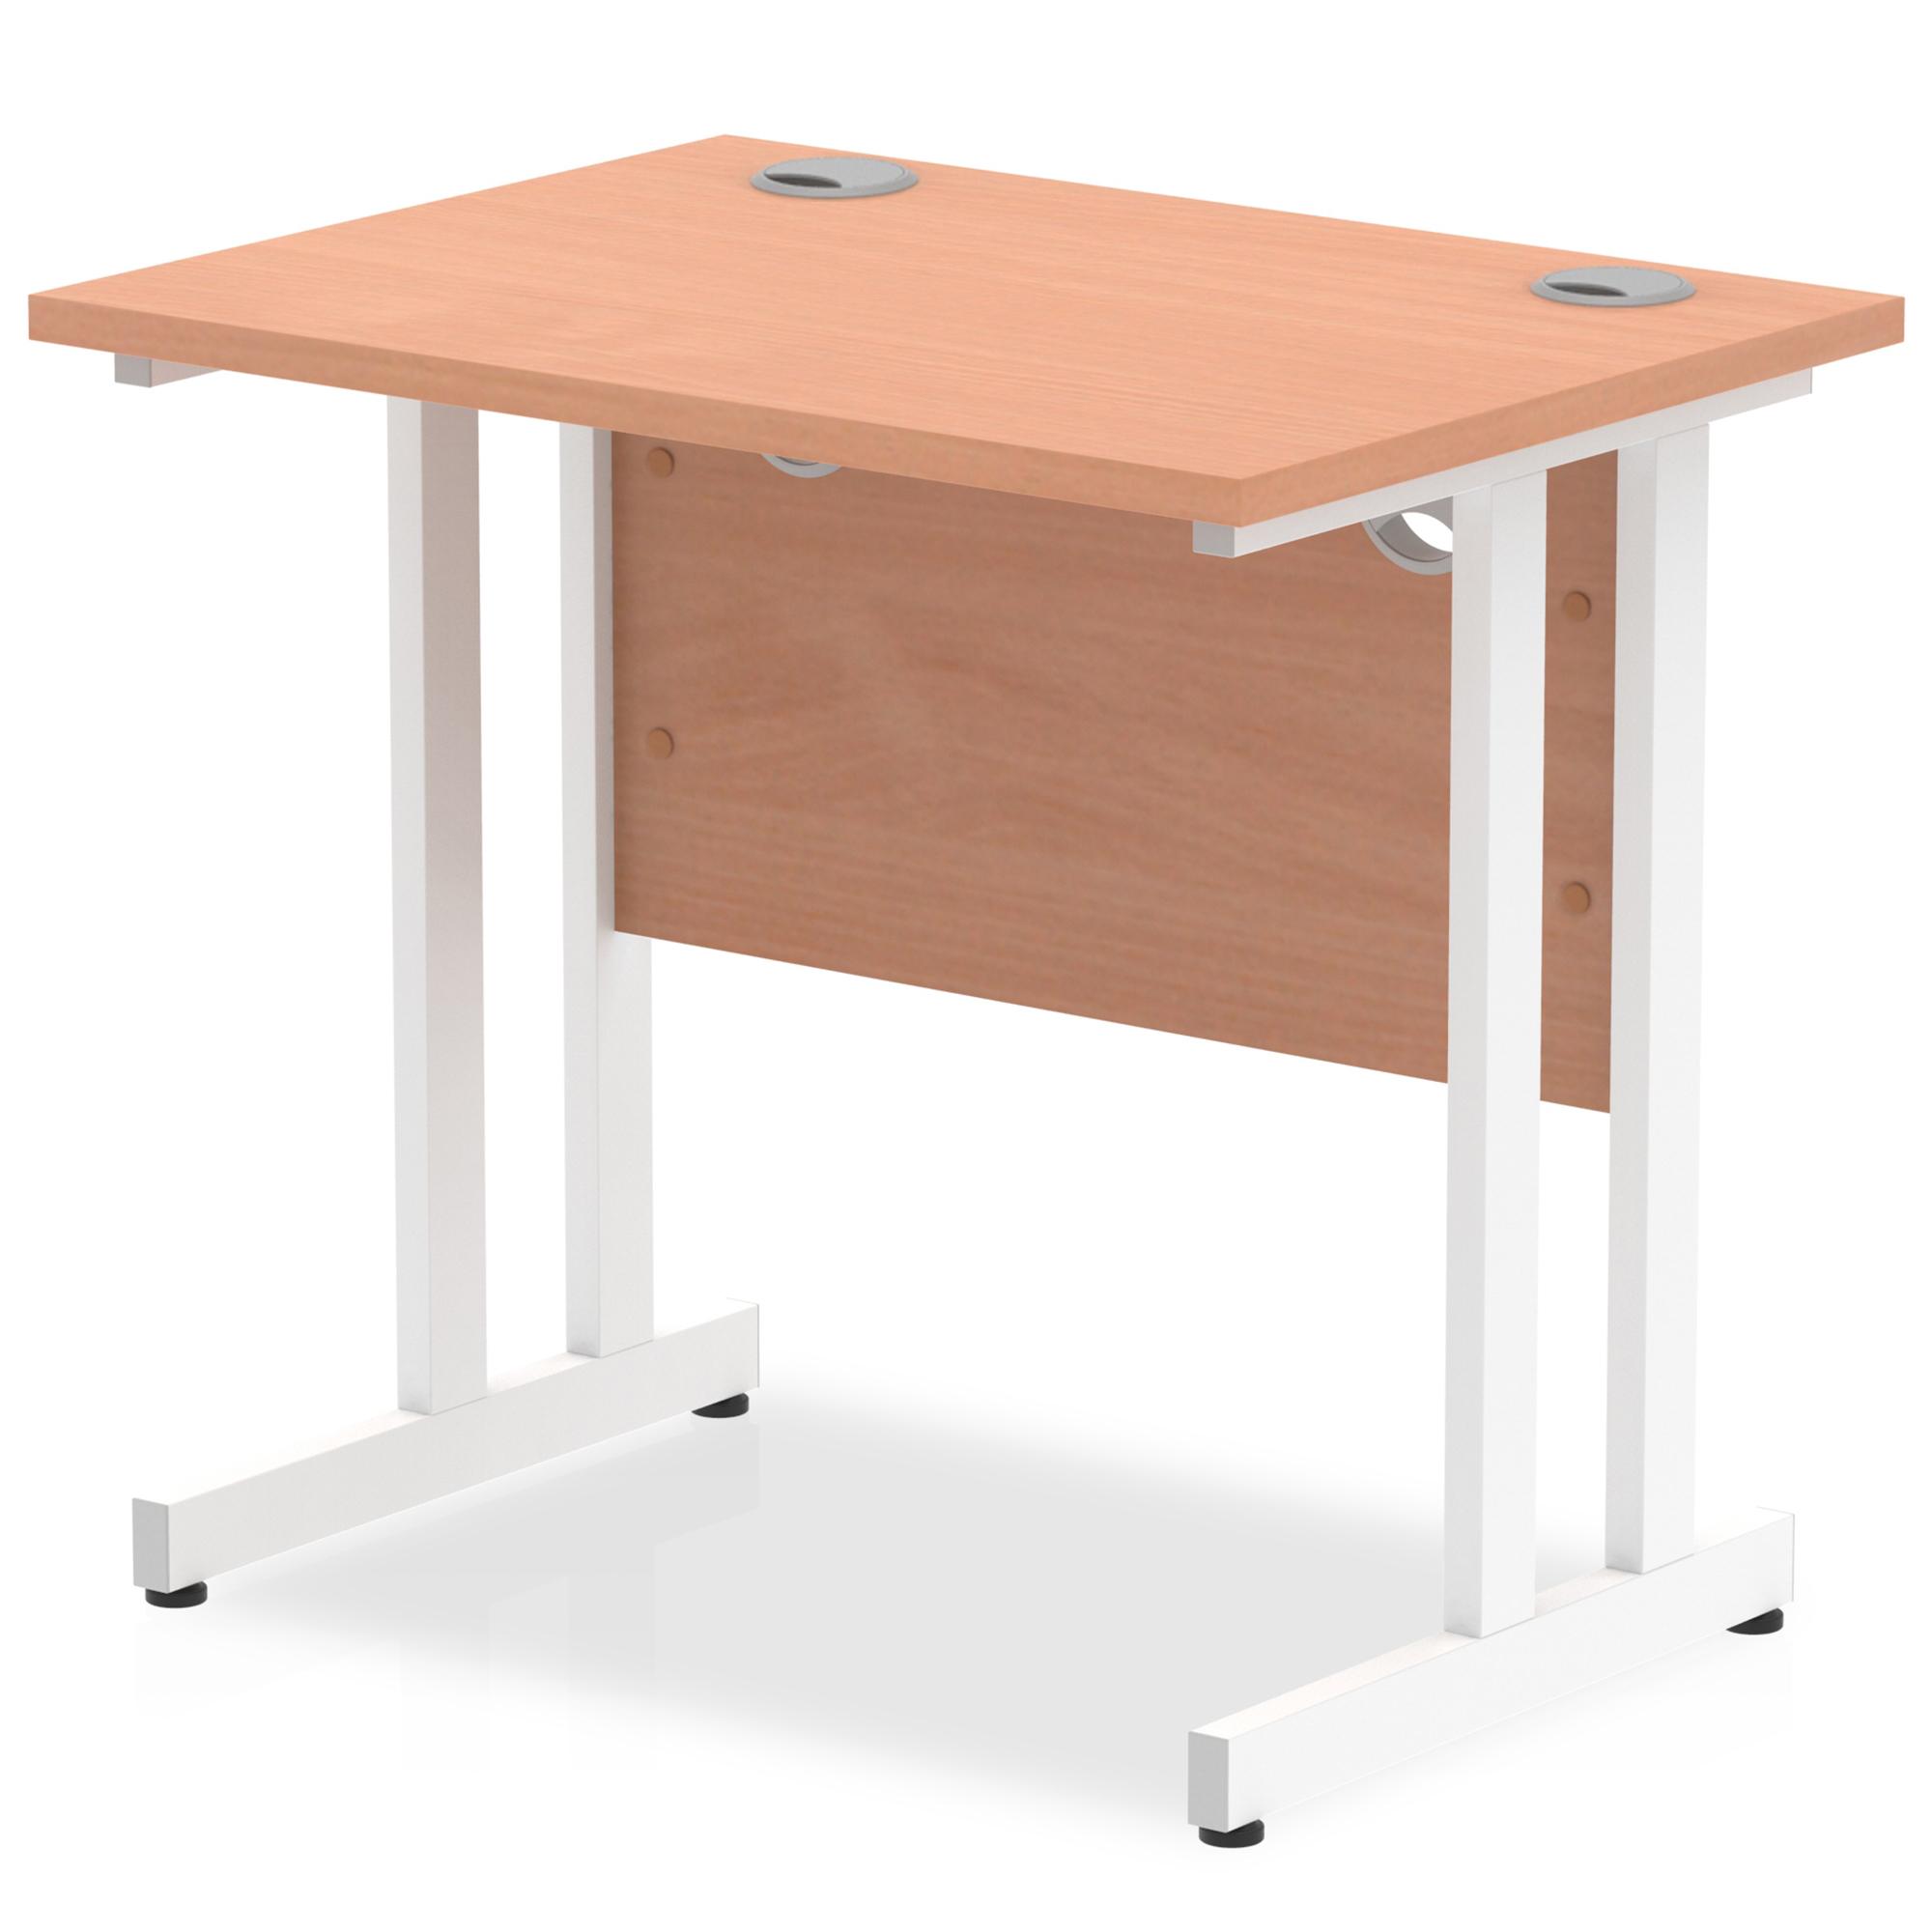 Trexus Desk Rectangle Cantilever White Leg 800x600mm Beech Ref MI002885